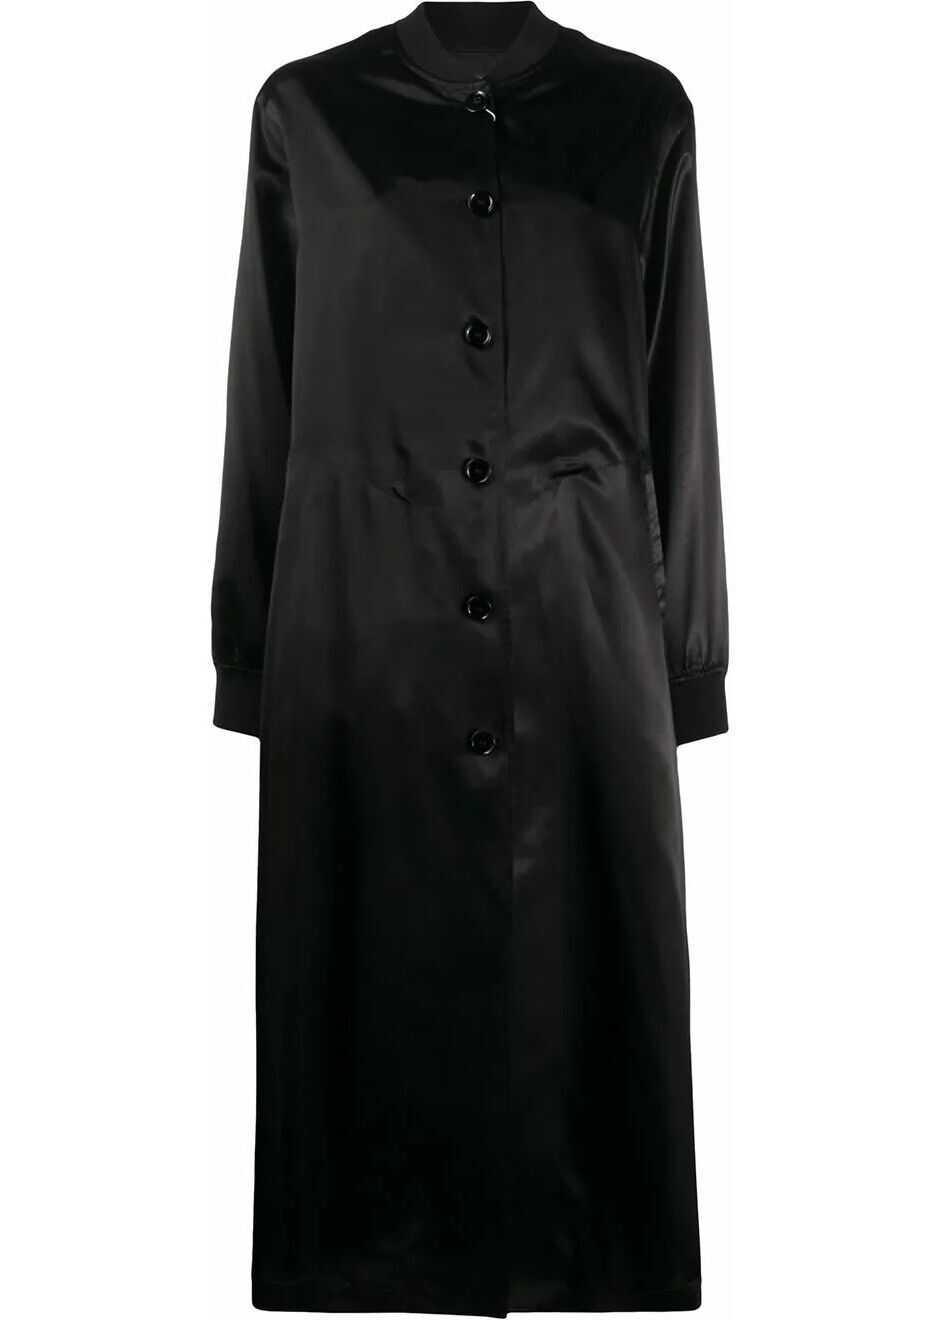 Maison Margiela Viscose Outerwear Jacket BLACK